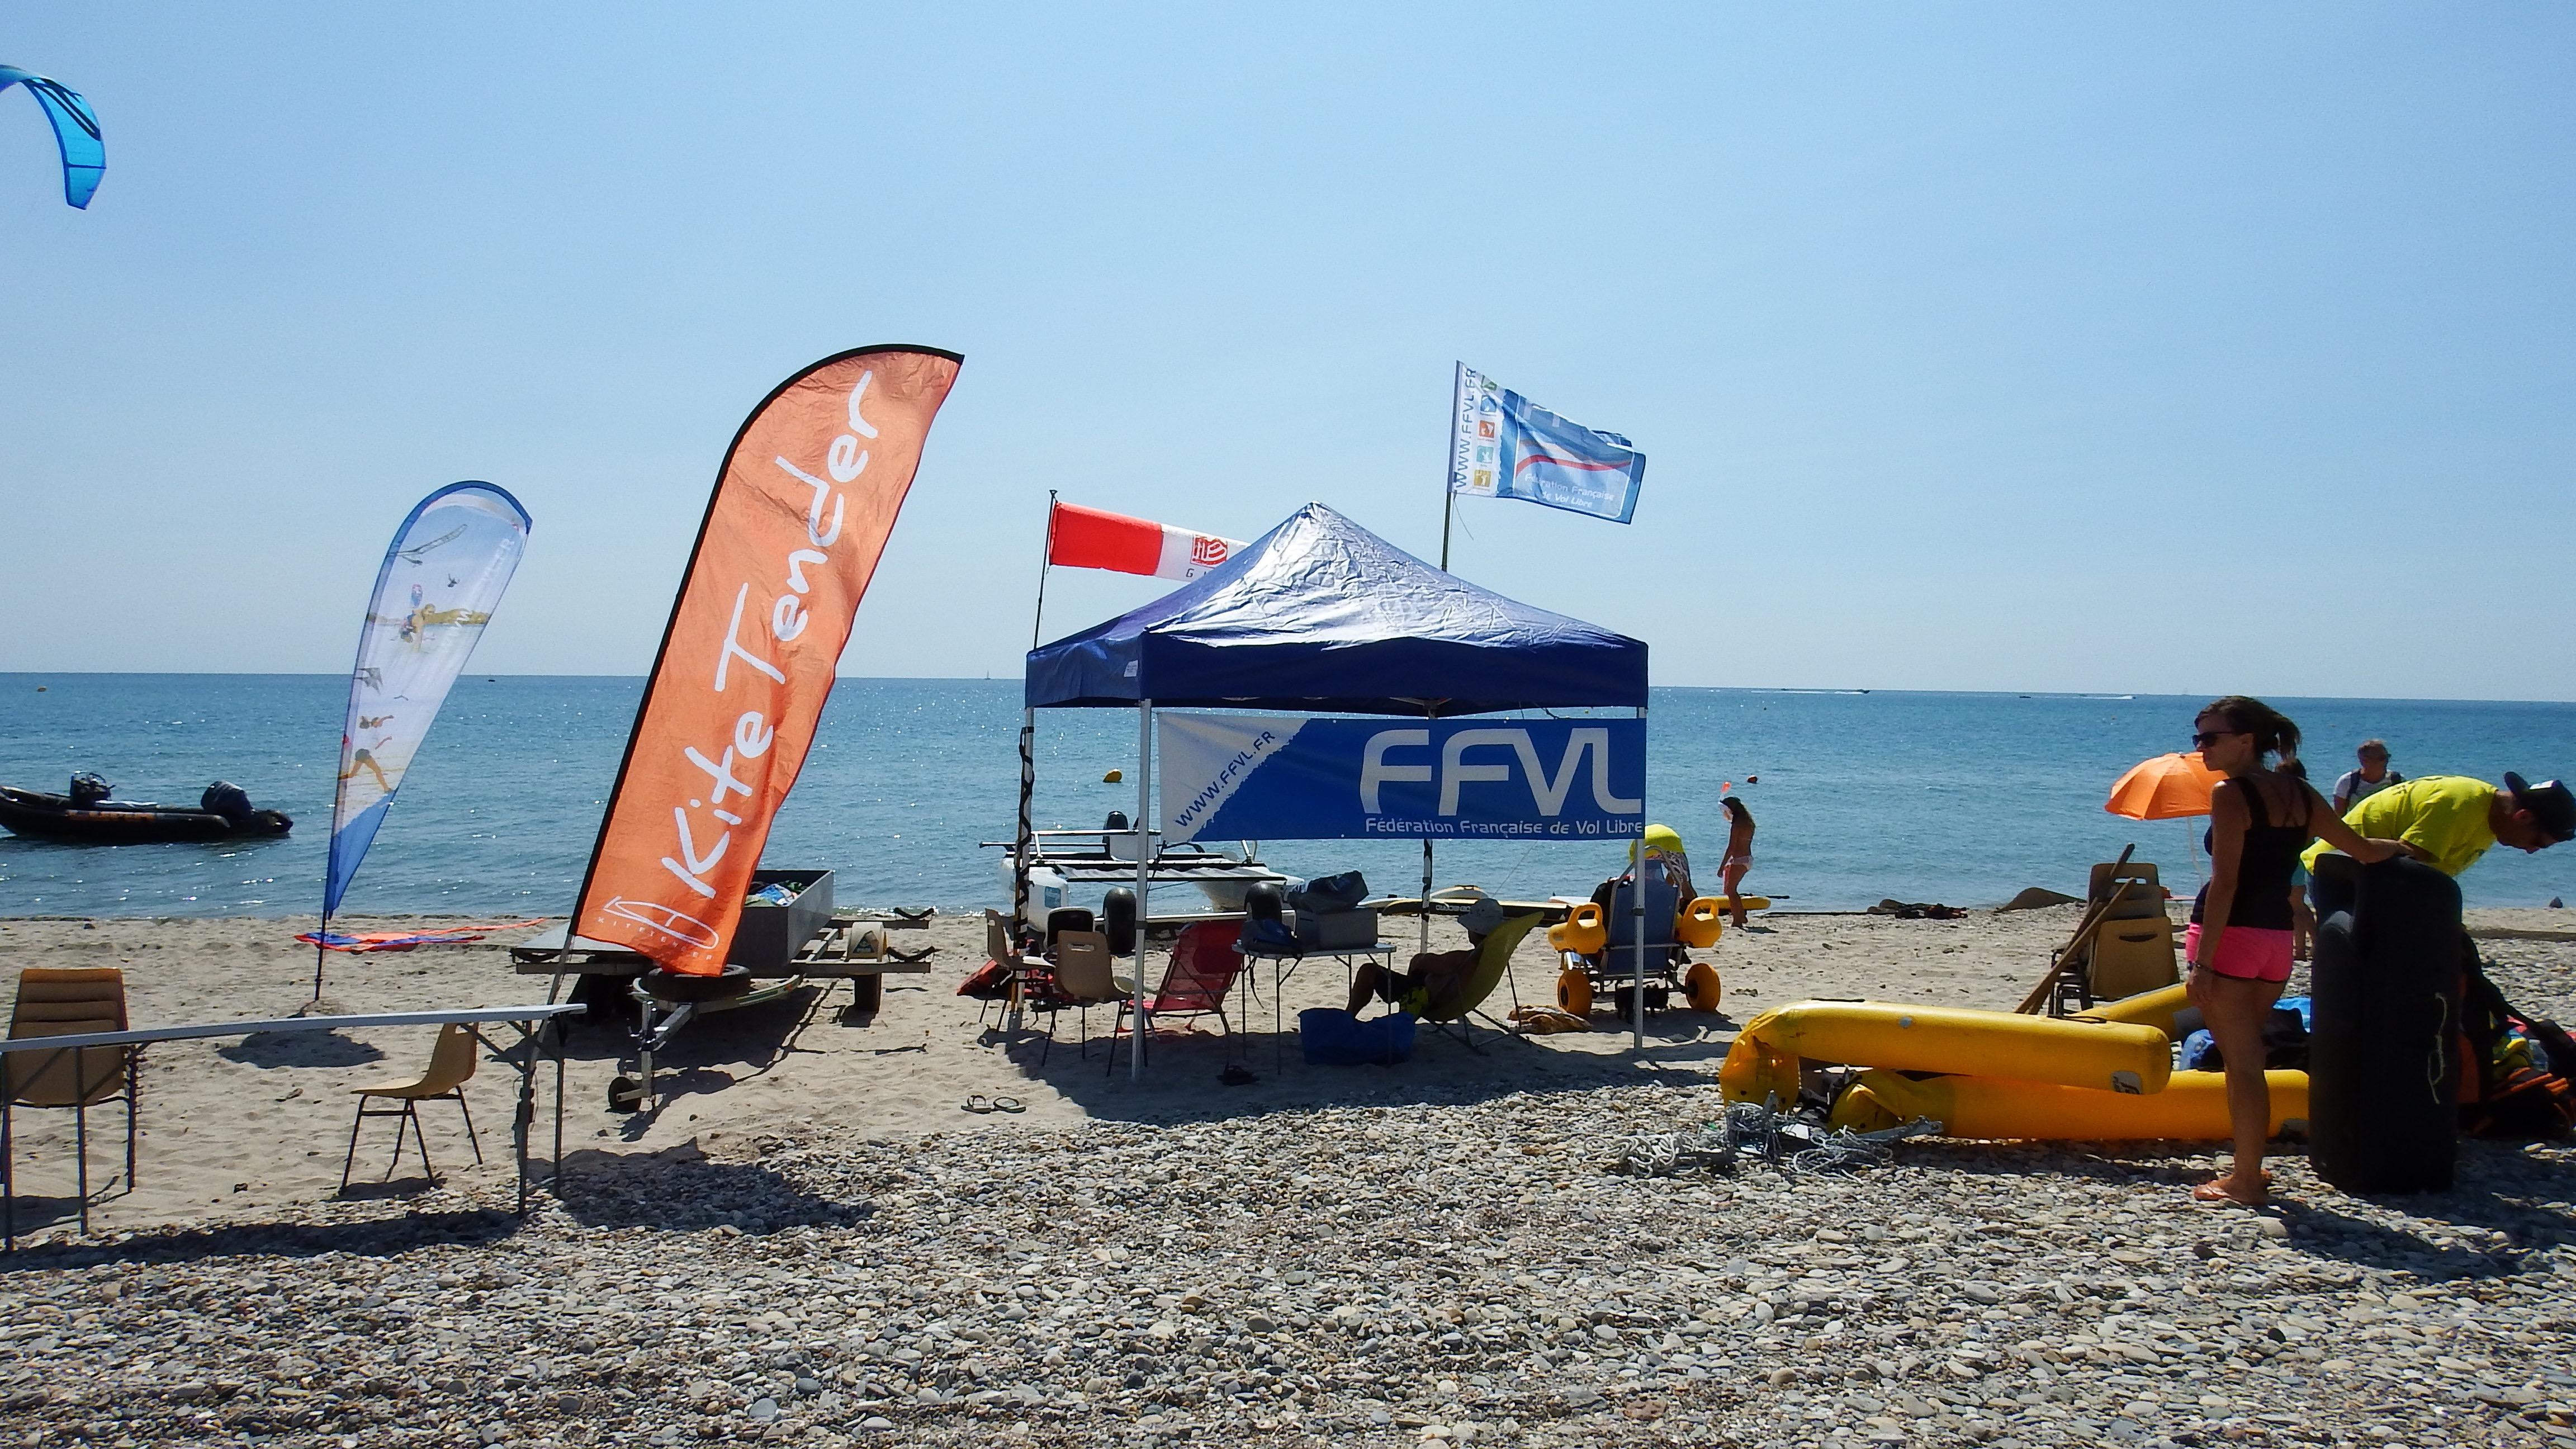 Affiliation FFVL